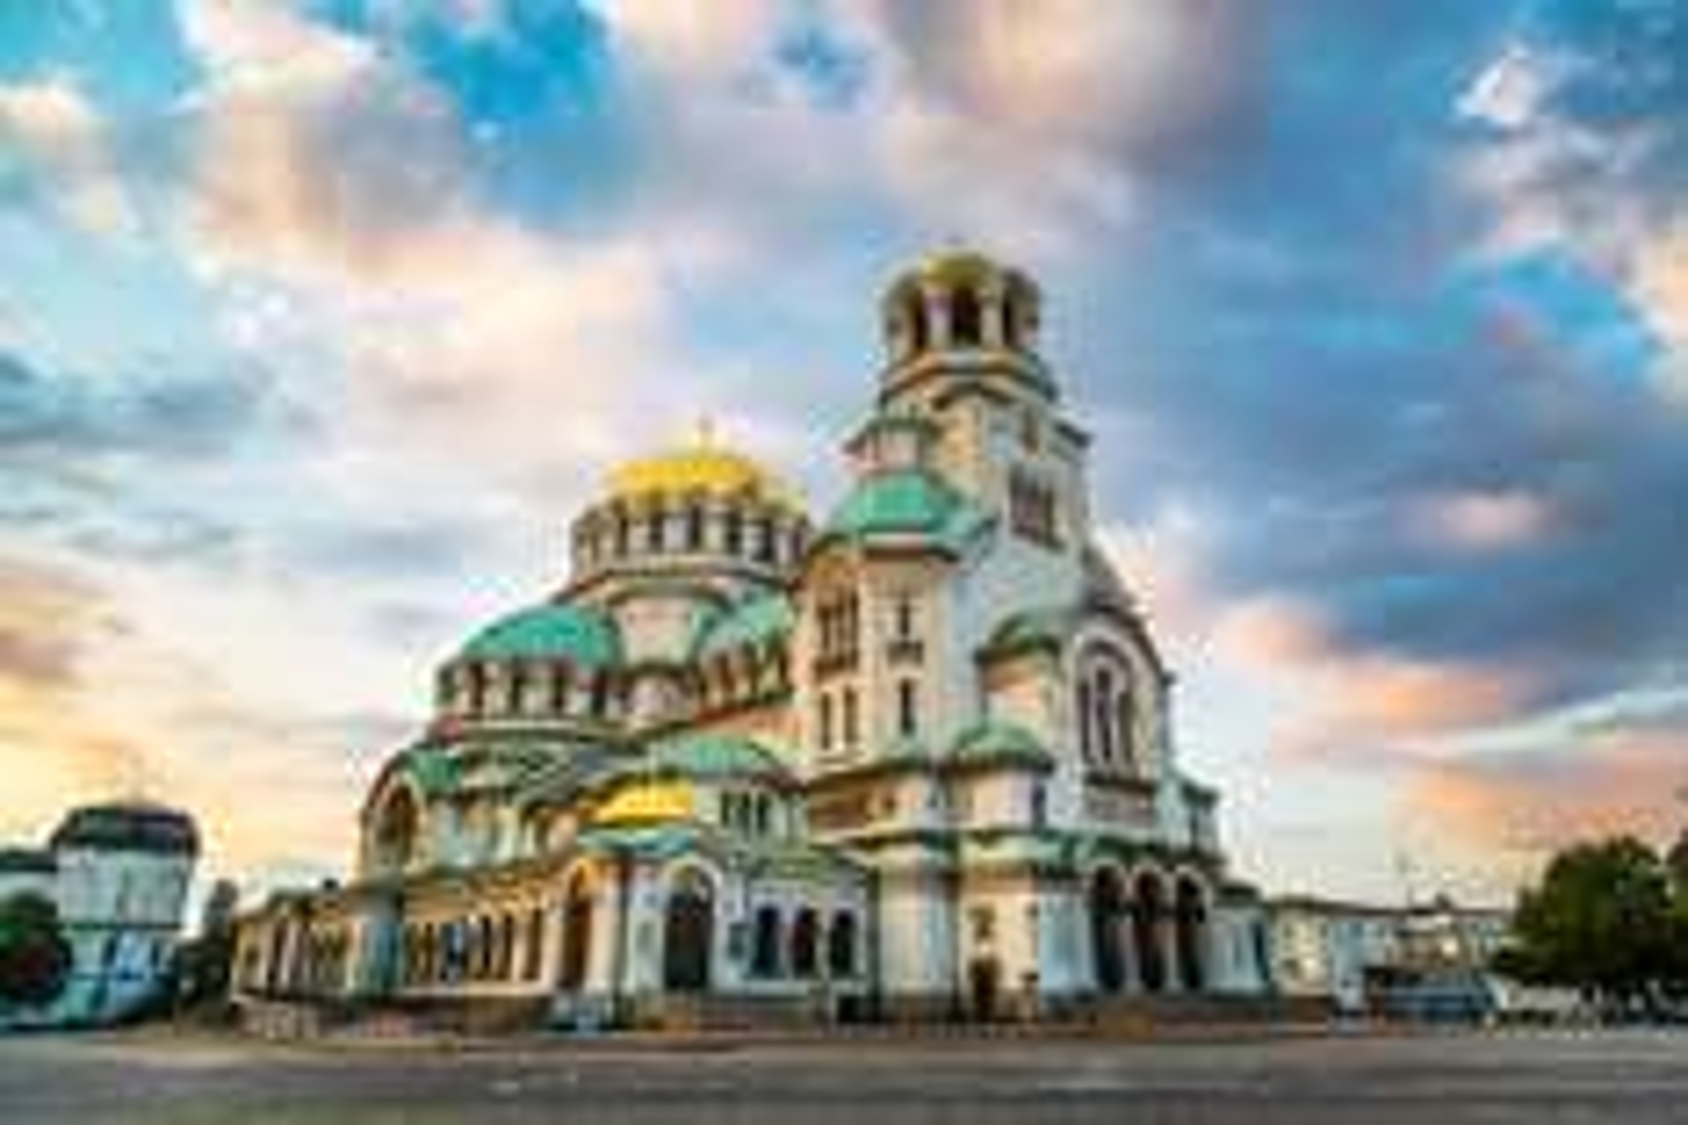 Lastminute Urlaub: 10 Tage Bulgarien im 3 Sterne Hotel inkl. Flug für 2 Personen